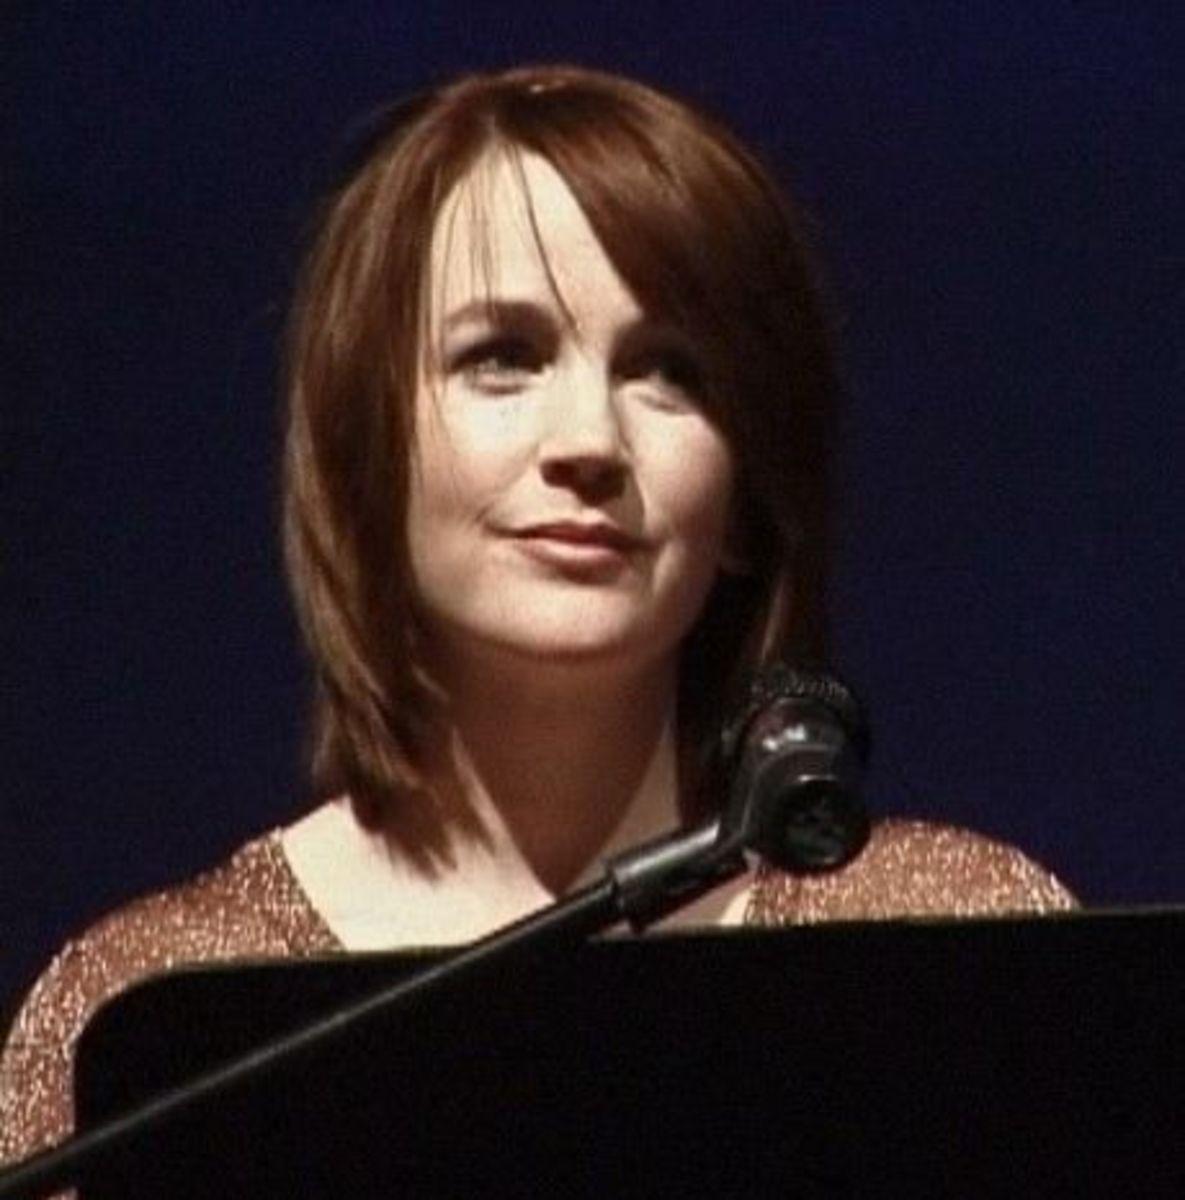 Renee O'Connor photo courtesy of Pasadena Burbank via Flickr Creative Commons